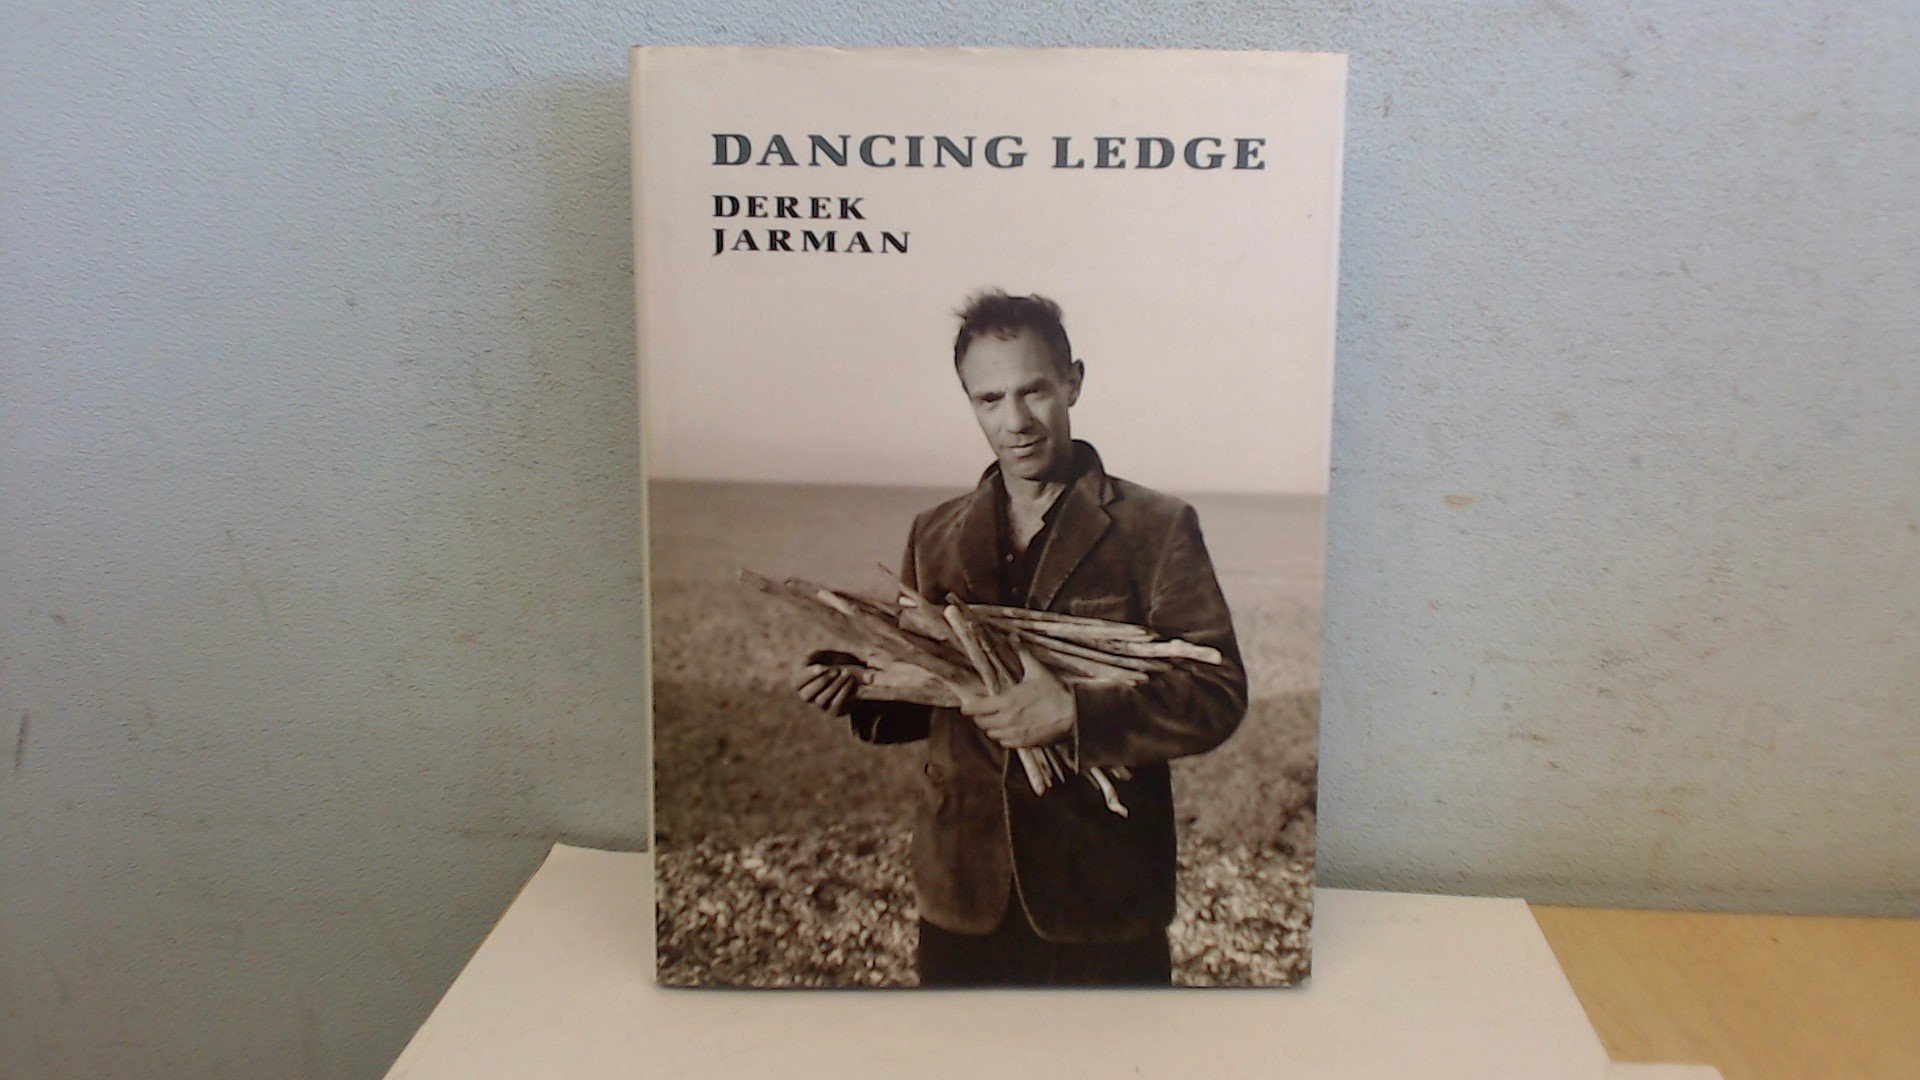 Dancing Ledge. [Subtitle]: Edited by Shaun Allen.